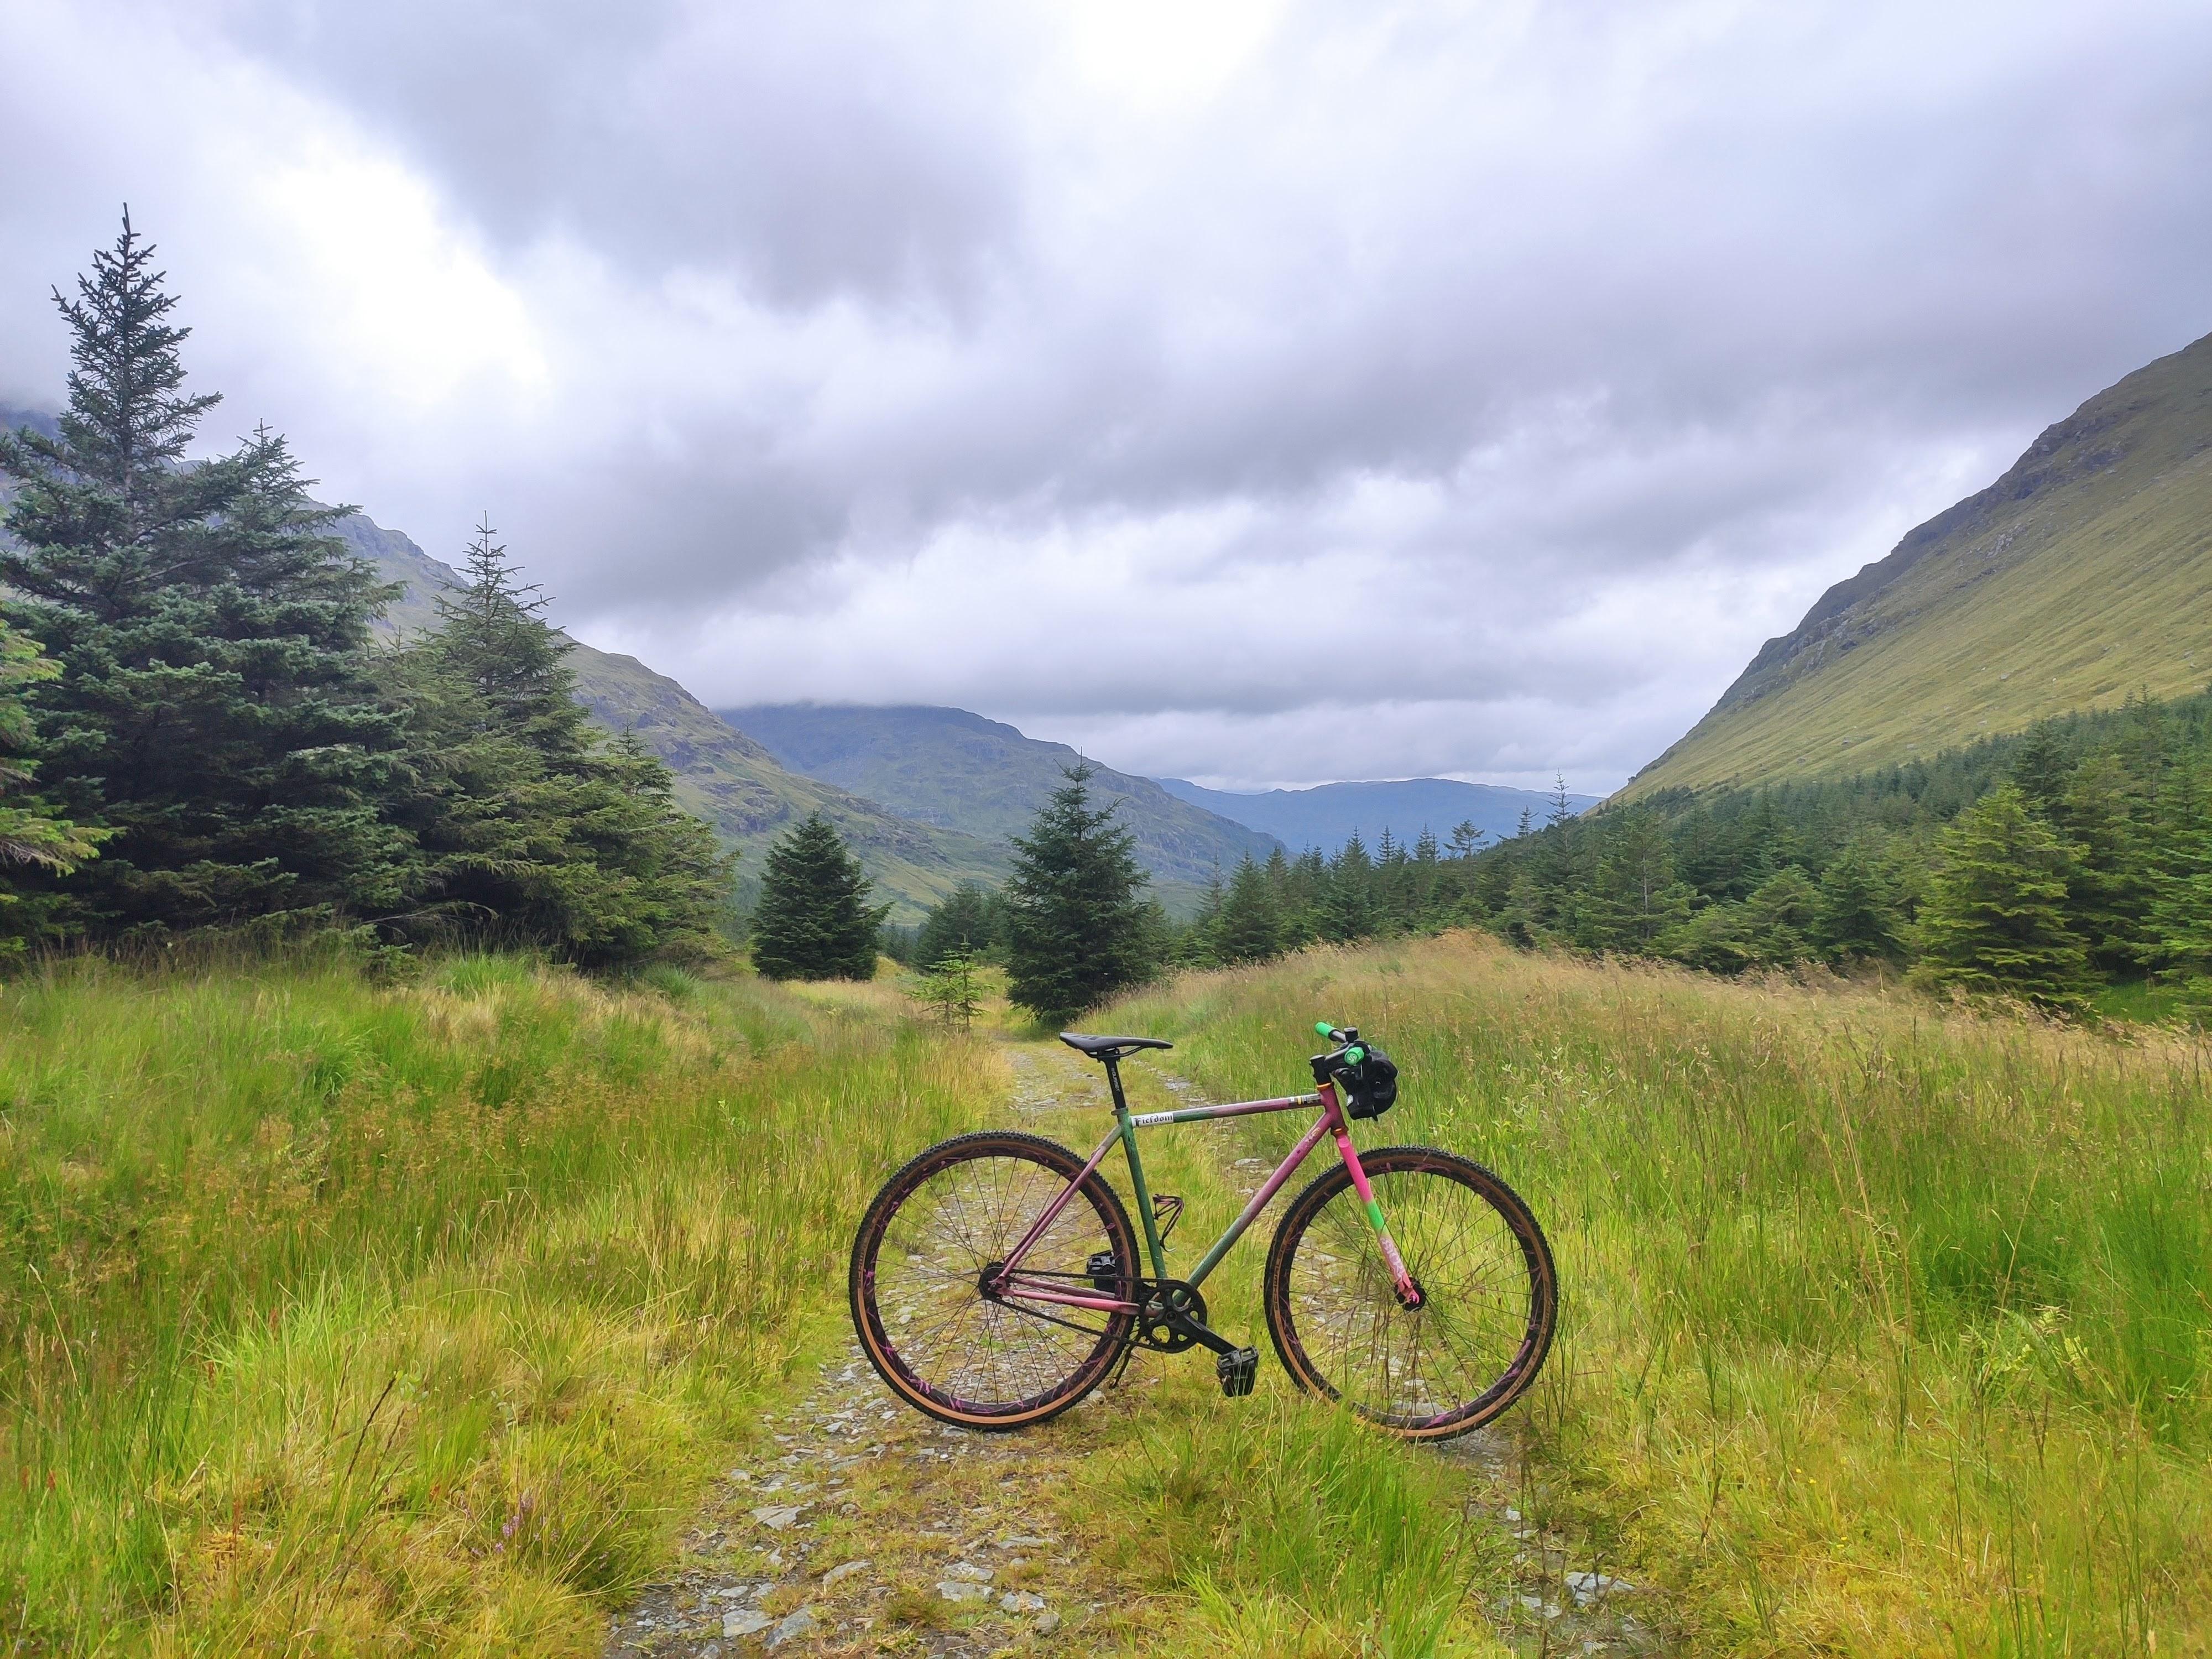 squid so-ez tracklocross bike in the scottish highlands